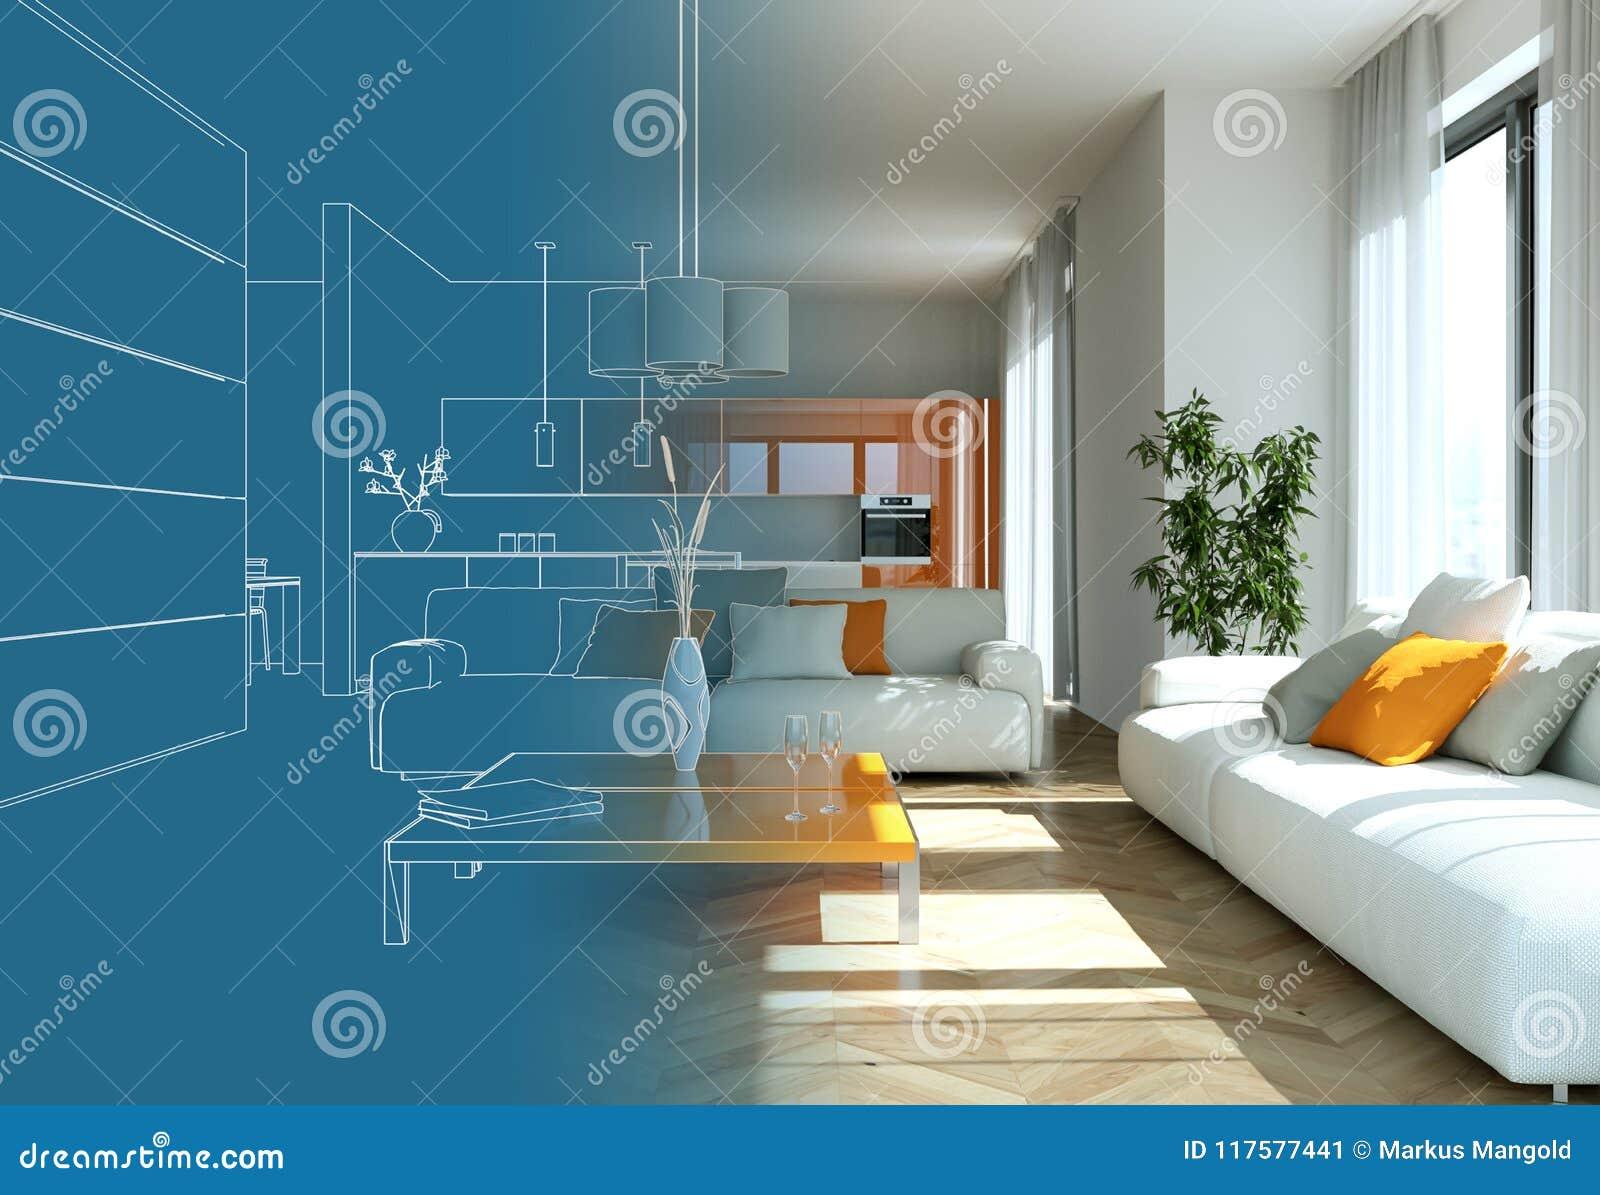 Download Interior Design Living Room Drawing Gradation Into Photograph Stock Illustration